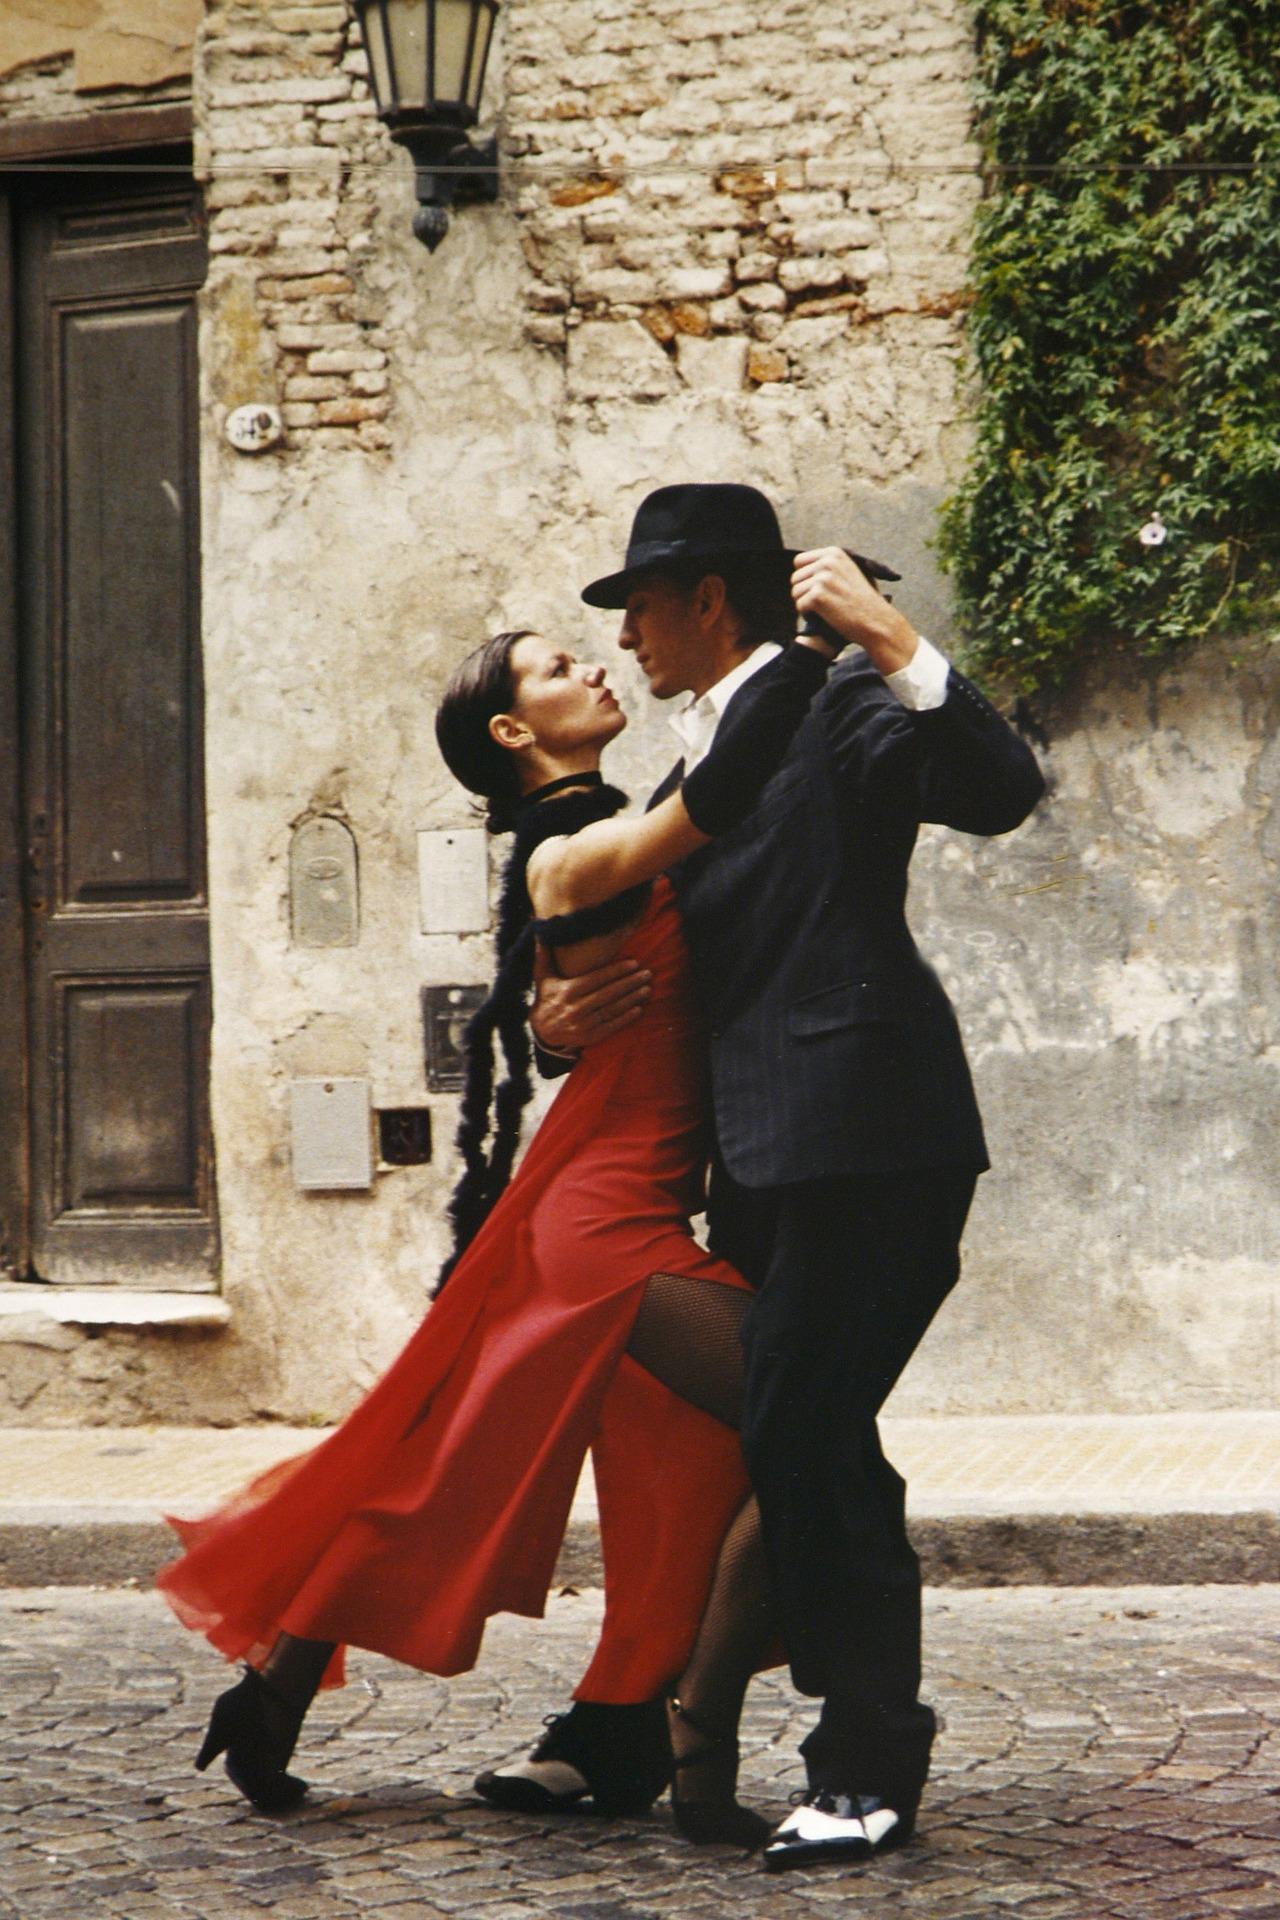 tango-190026_1920